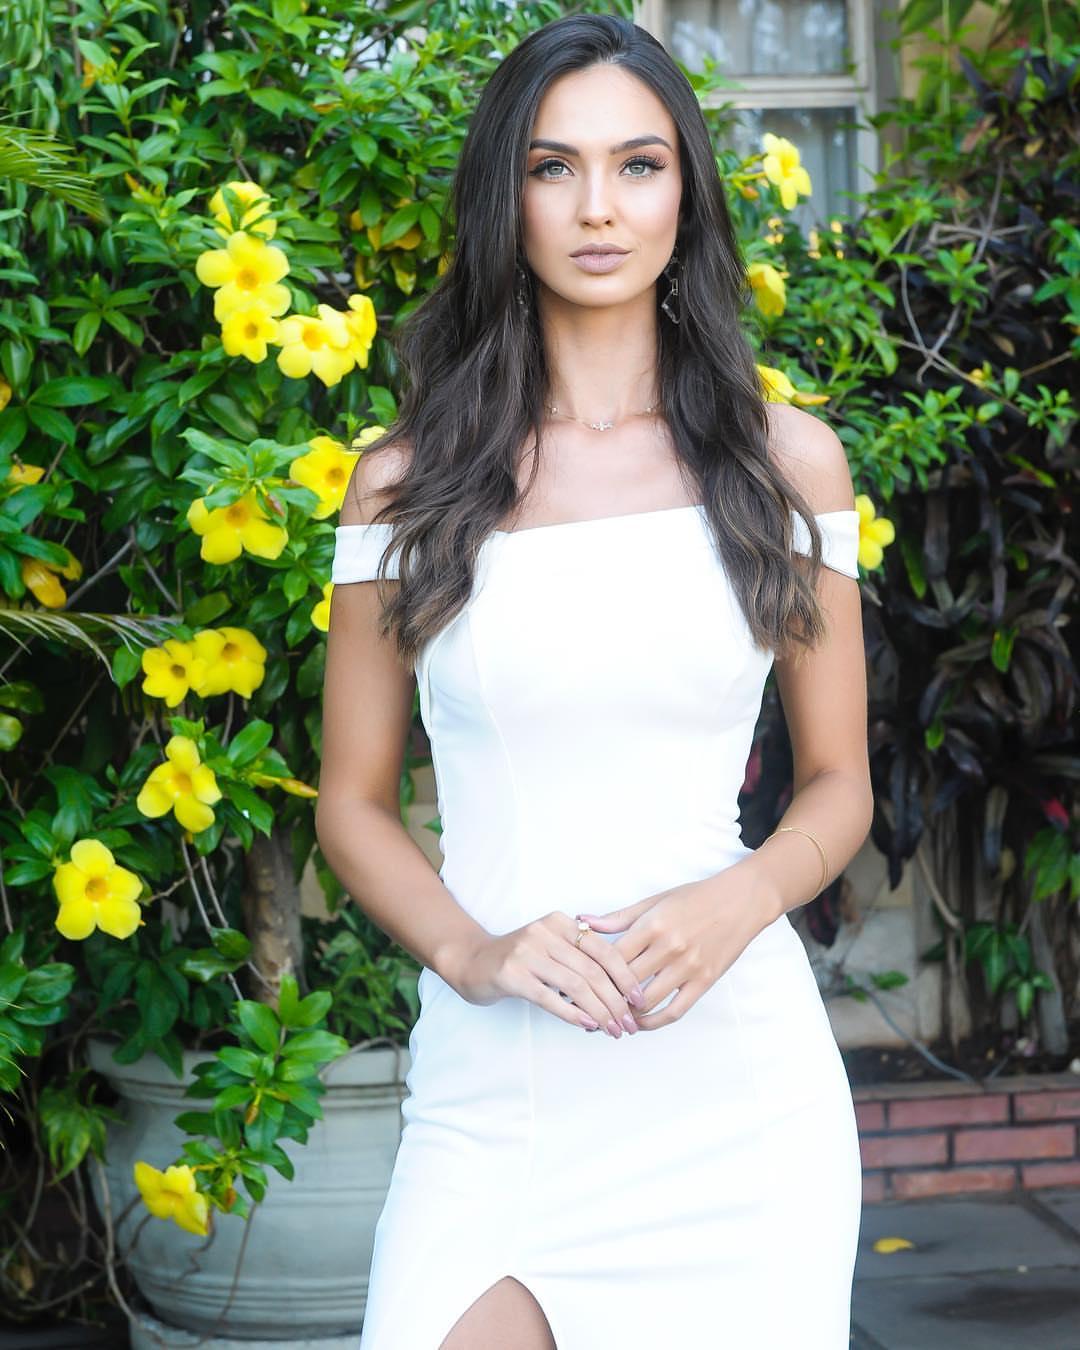 bianca scheren, top 5 de miss brasil universo 2019. - Página 3 49406612